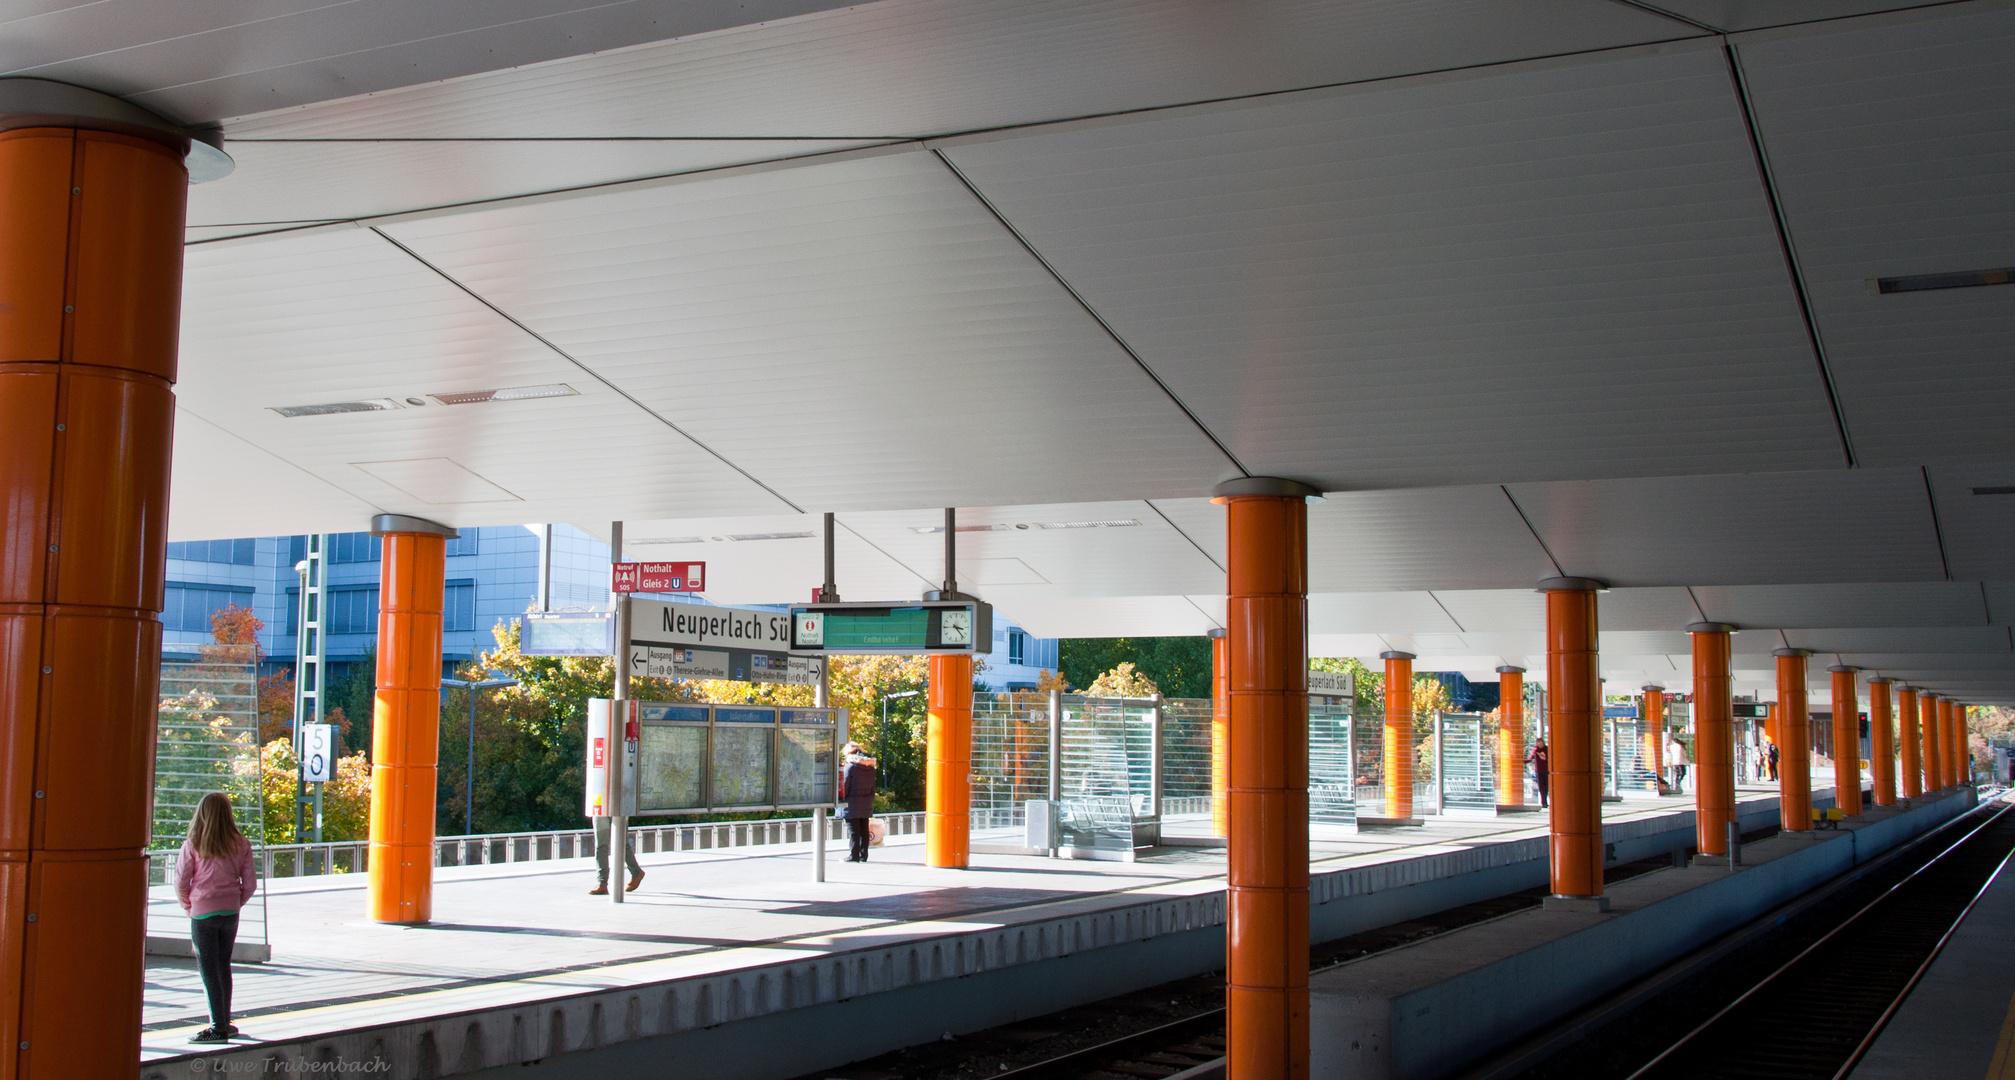 U-Bahnhof Neuperlach Süd (1)